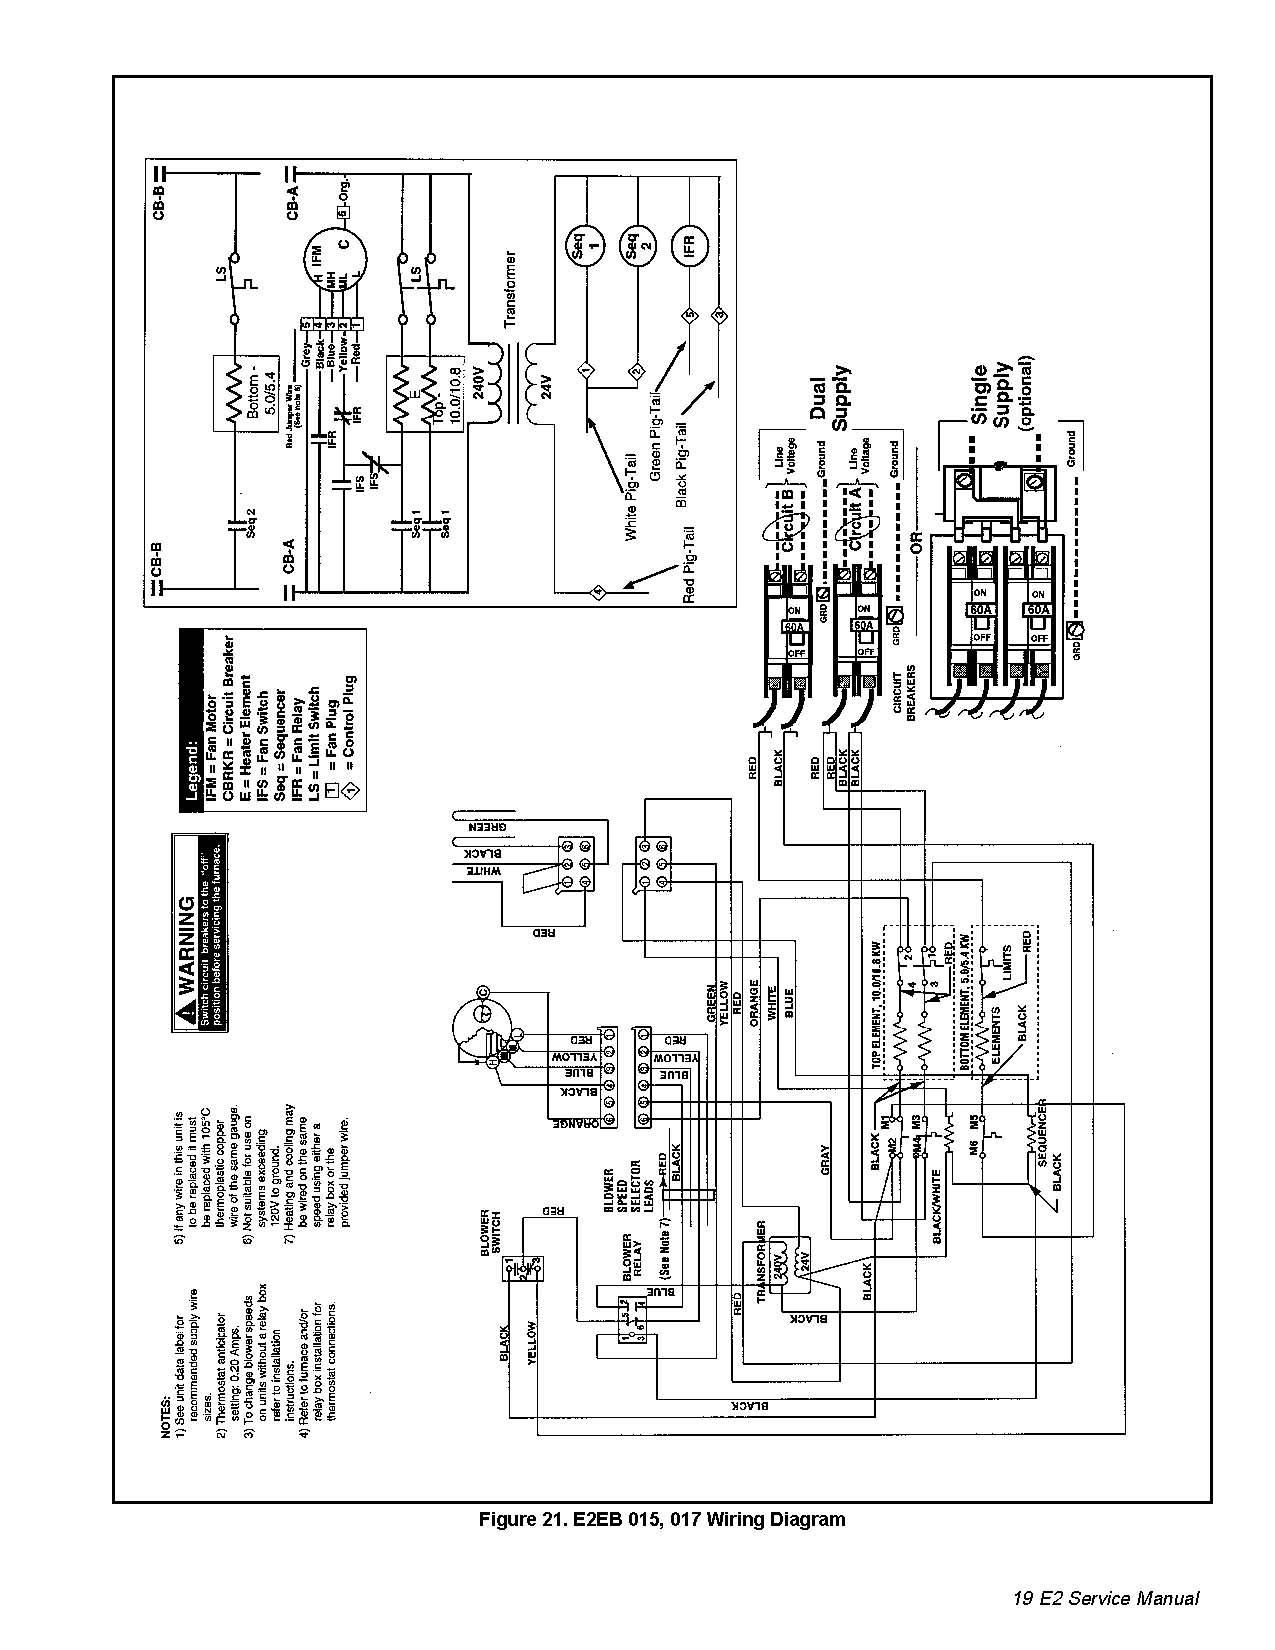 Why Are Schematic Diagrams Useful on cutaway diagram, yed graph diagram, circuit diagram, wiring diagram, critical mass diagram, isometric diagram, exploded view diagram, electric current diagram, network diagram, concept diagram, carm diagram, sequence diagram, line diagram, process diagram, problem solving diagram, system diagram, block diagram, schema diagram, flow diagram,